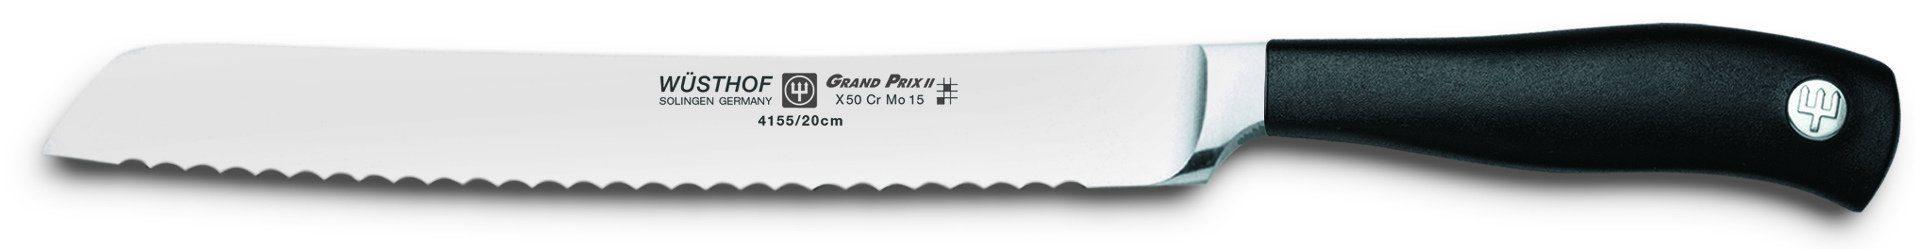 Wüsthof Brotmesser »Grand Prix ll«